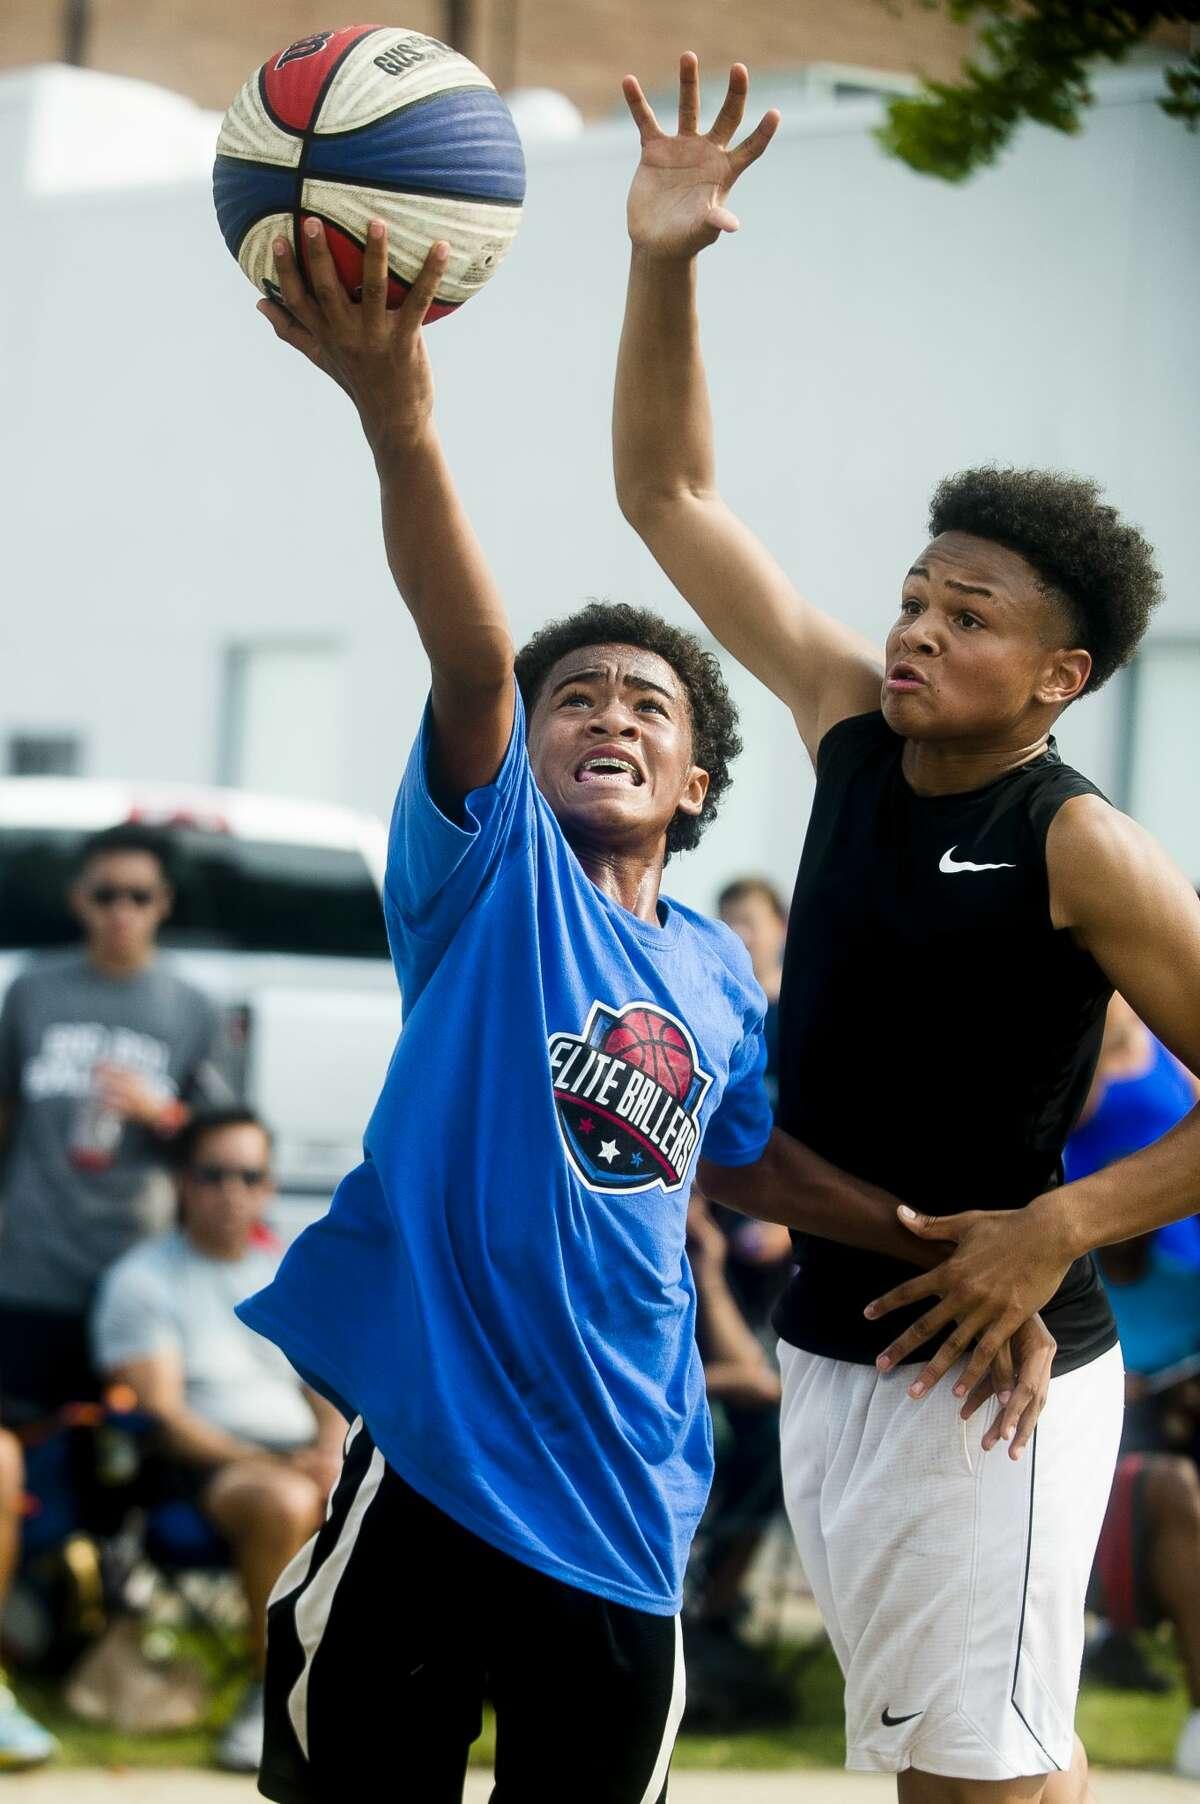 FILE - Chris Robinson of Lansing, 14, plays in the Gus Macker three-on-three basketball tournament in downtown Midlandon Saturday, Aug. 18, 2018. (Katy Kildee/kkildee@mdn.net)